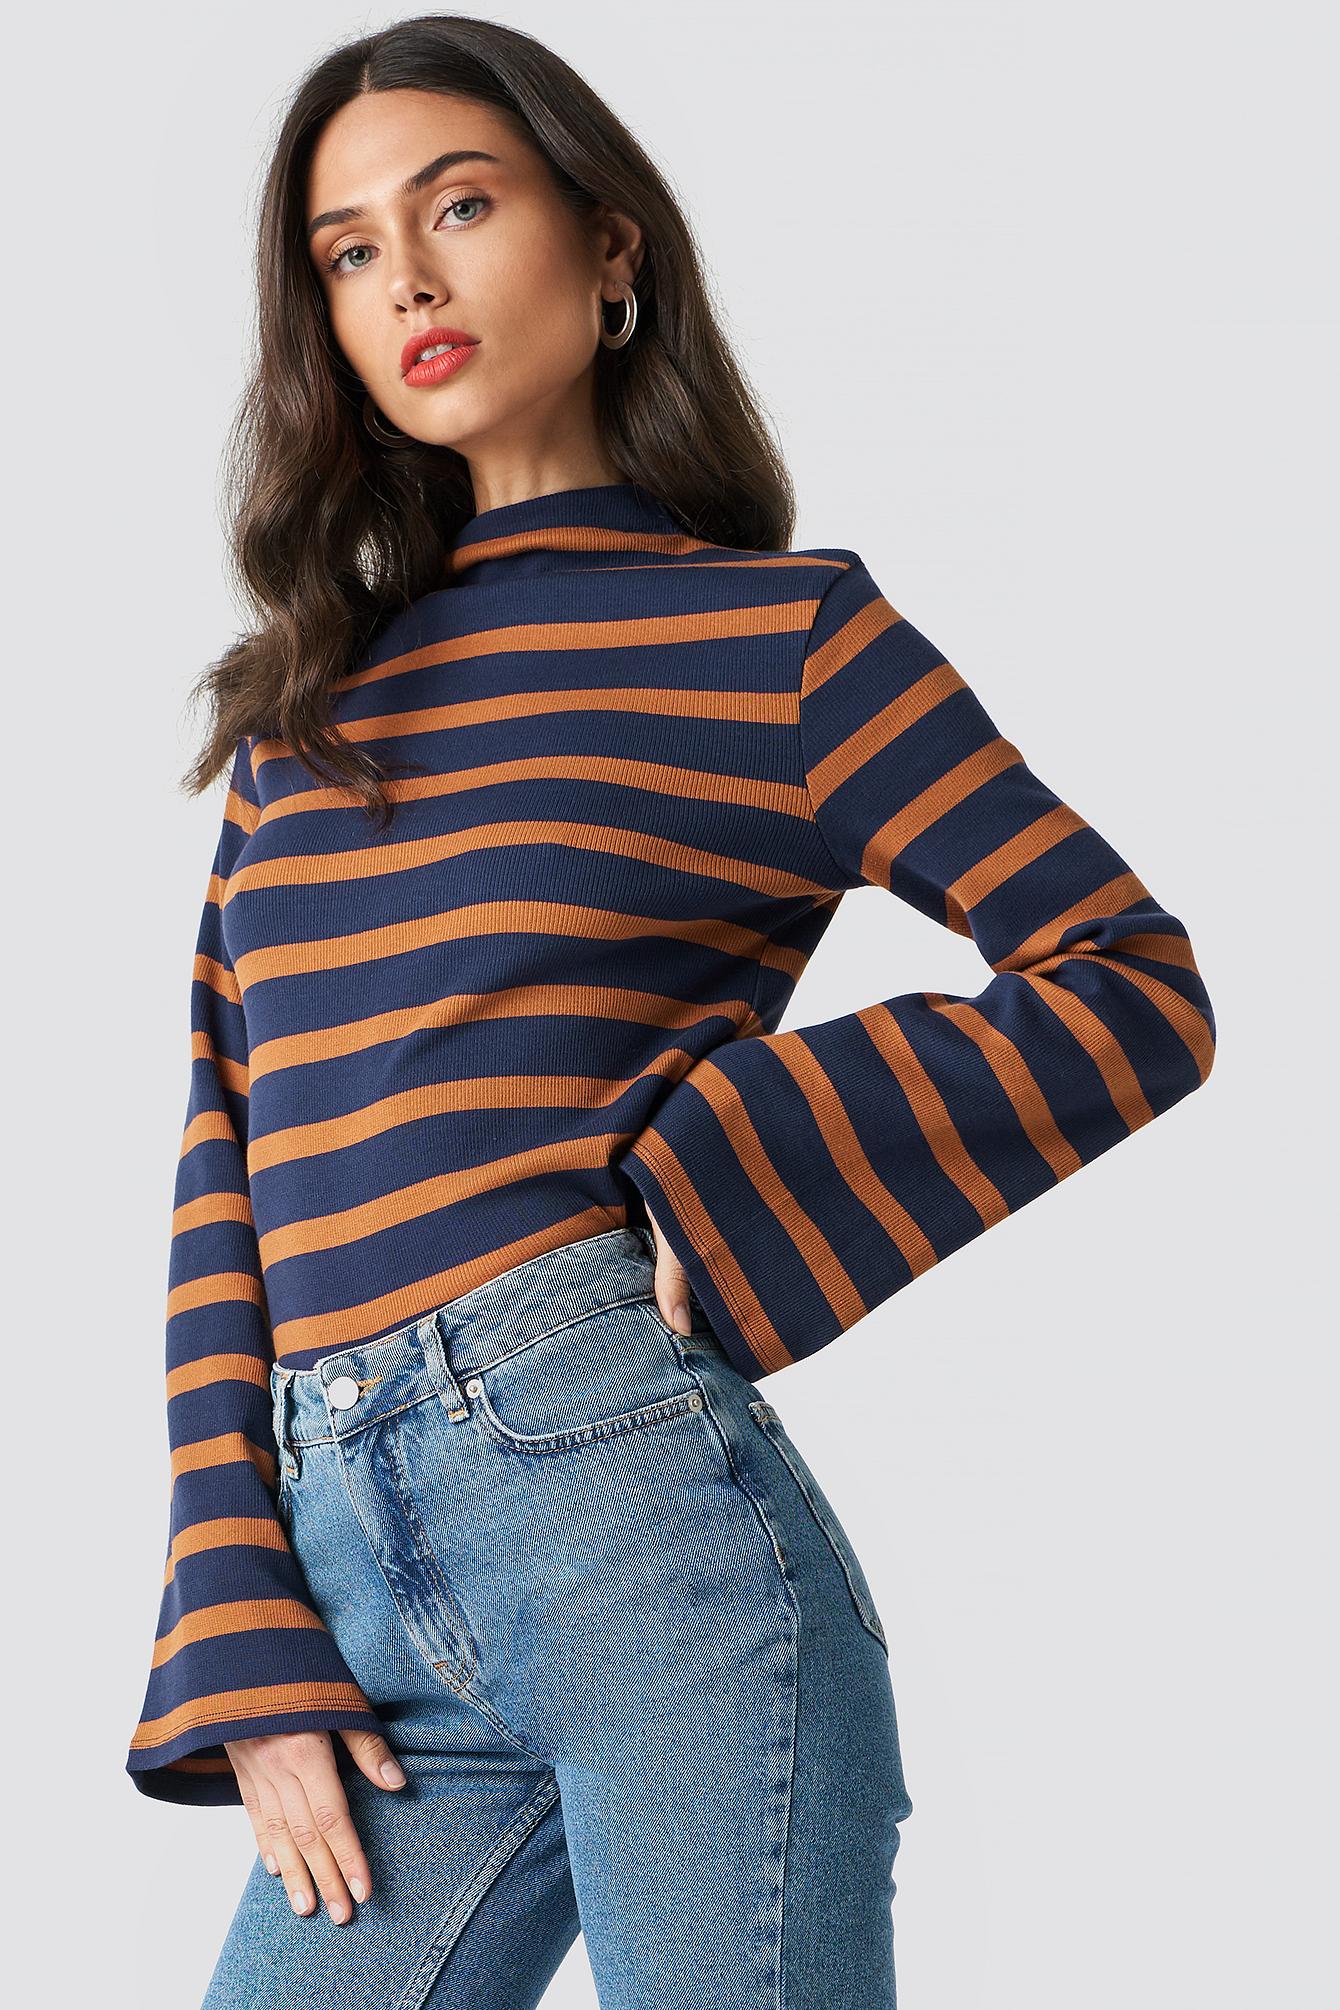 na-kd -  Turtle Neck Striped Top - Orange,Blue